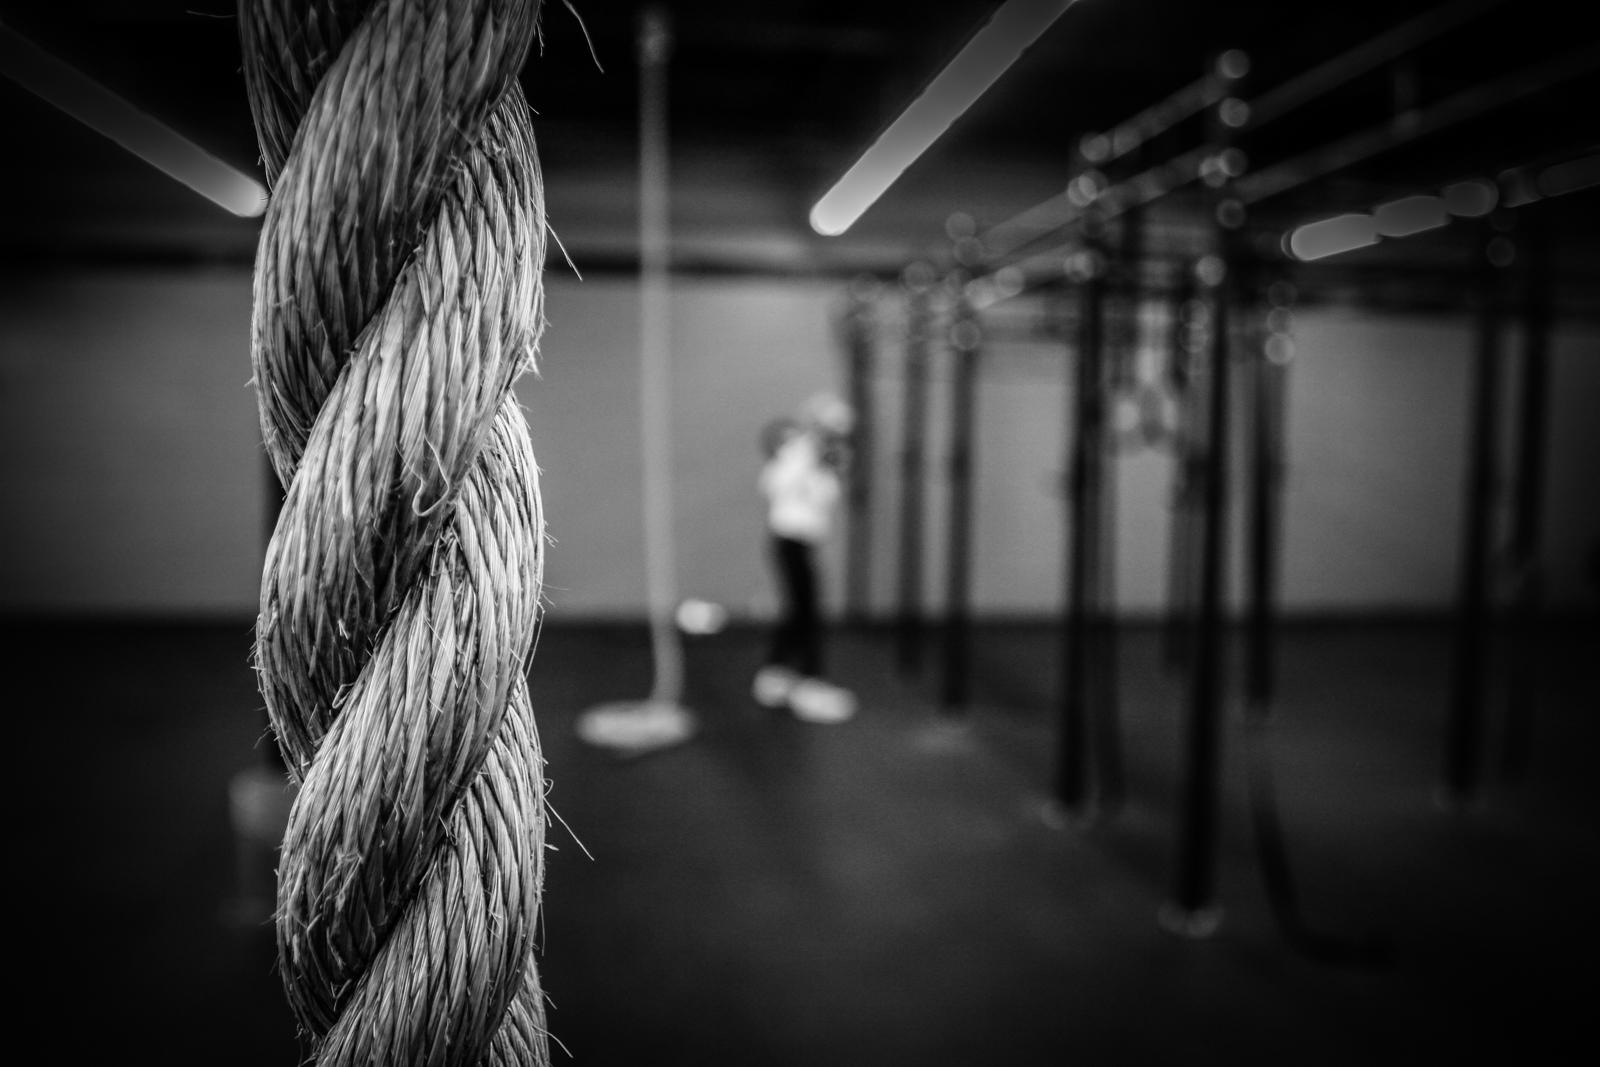 Beijing olympics weightlifting wallpaper 5 1024x768 wallpaper - Upt Crossfit Montreal Crossfit Olympic Weightlifting Personal